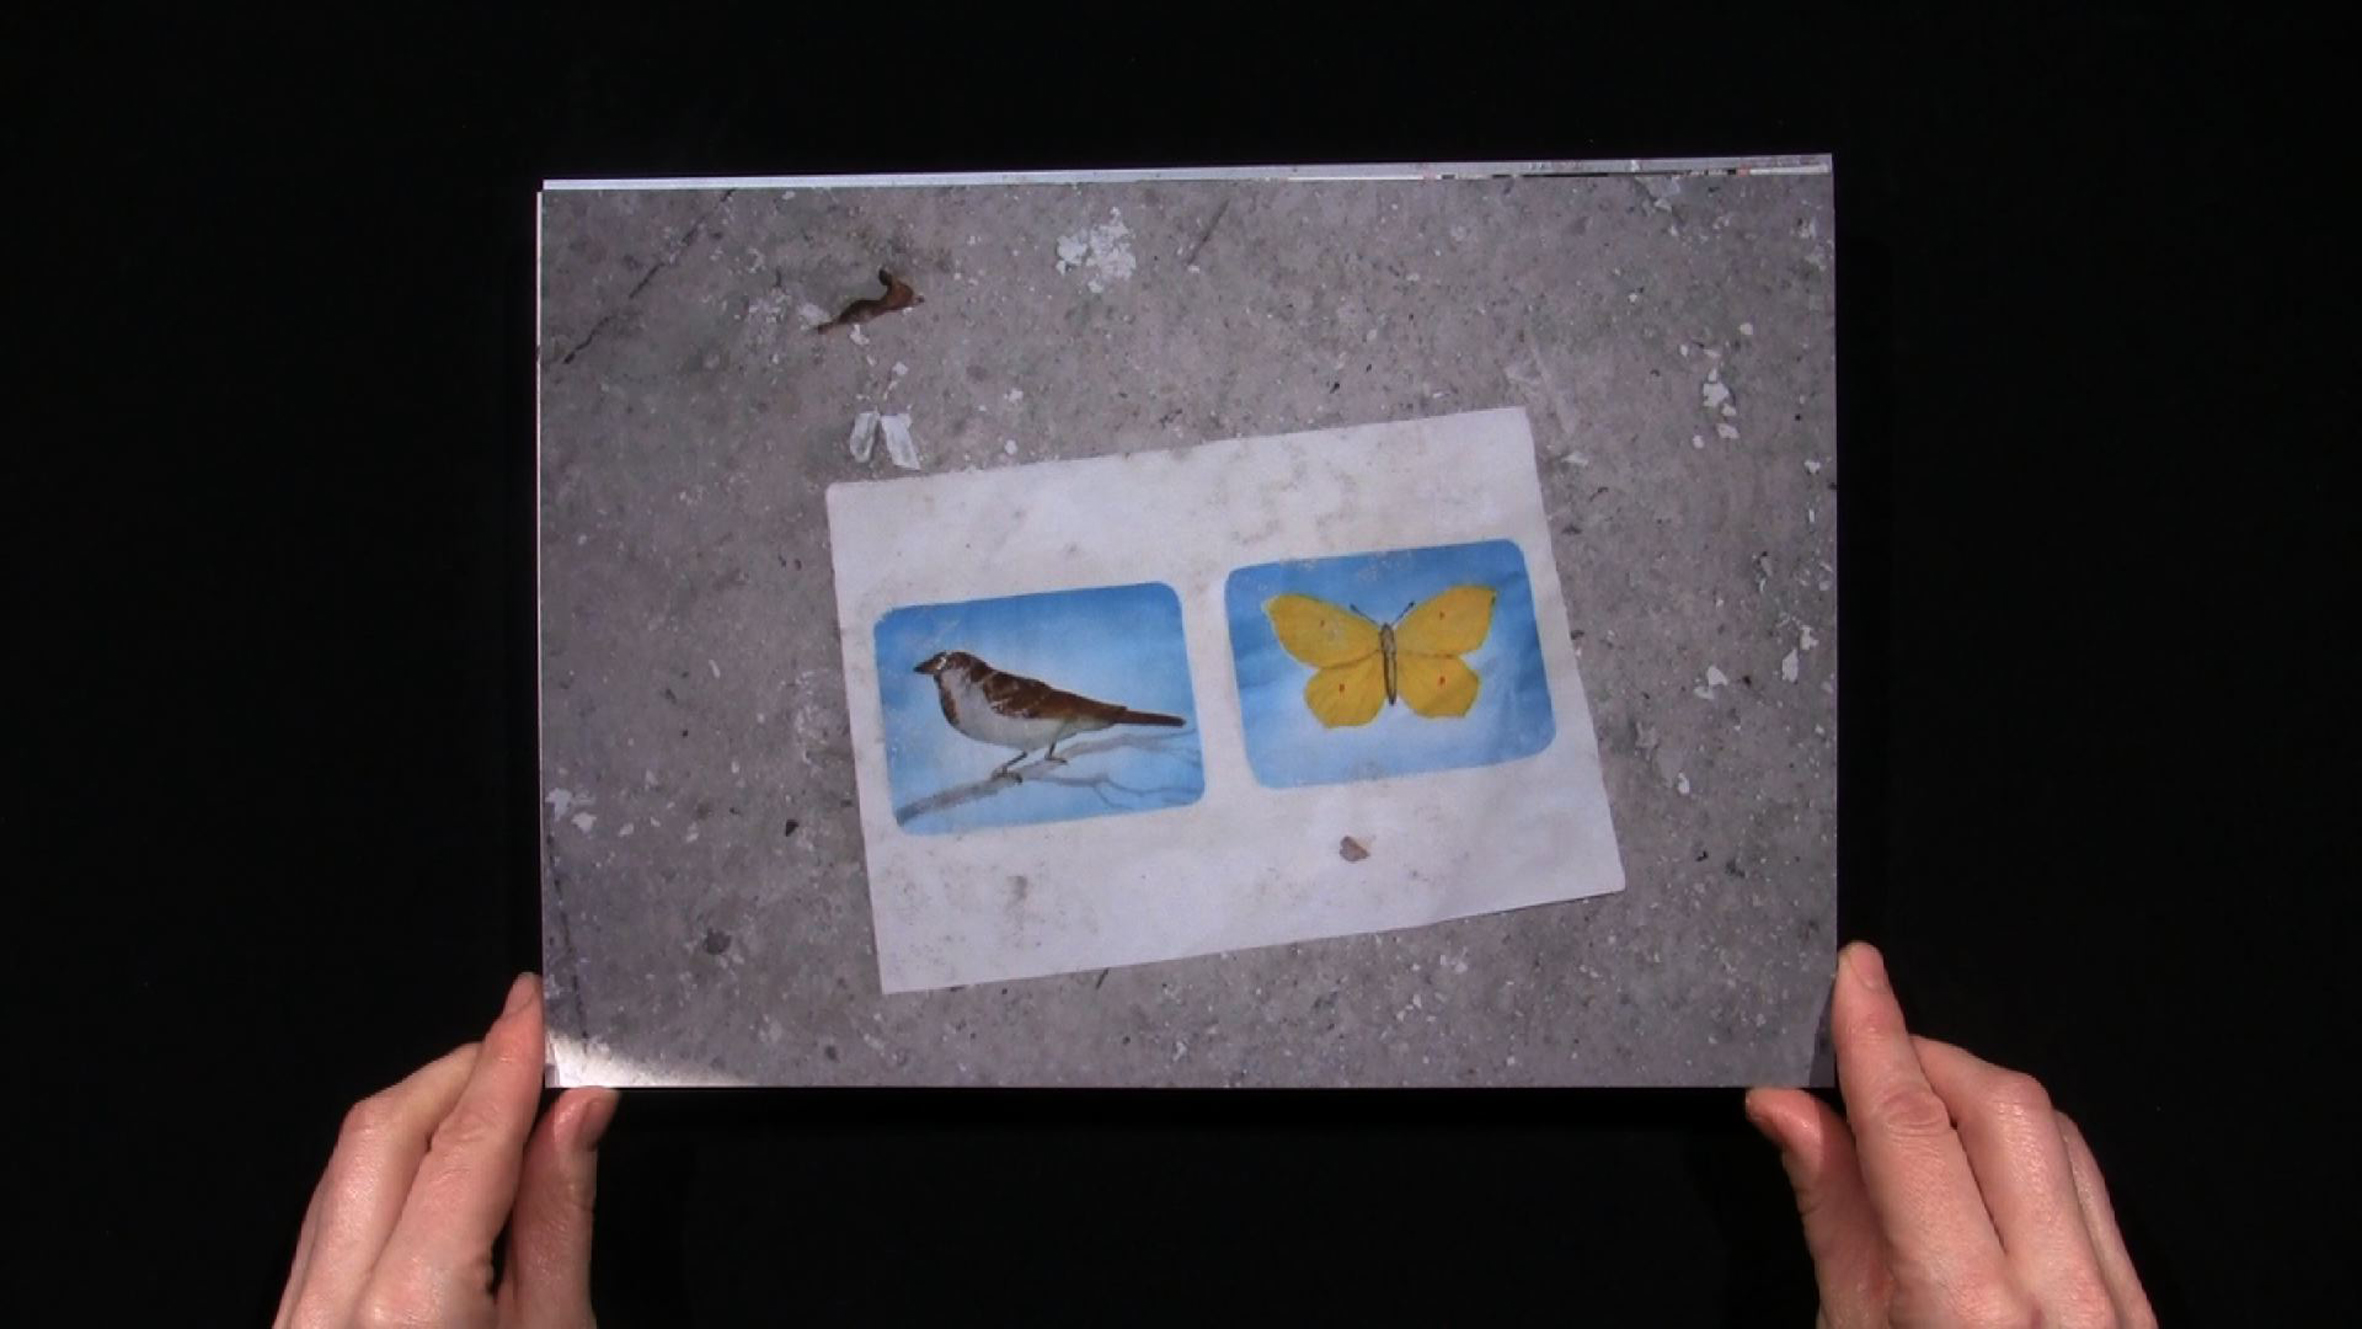 Lina Selander at the Venice Biennale